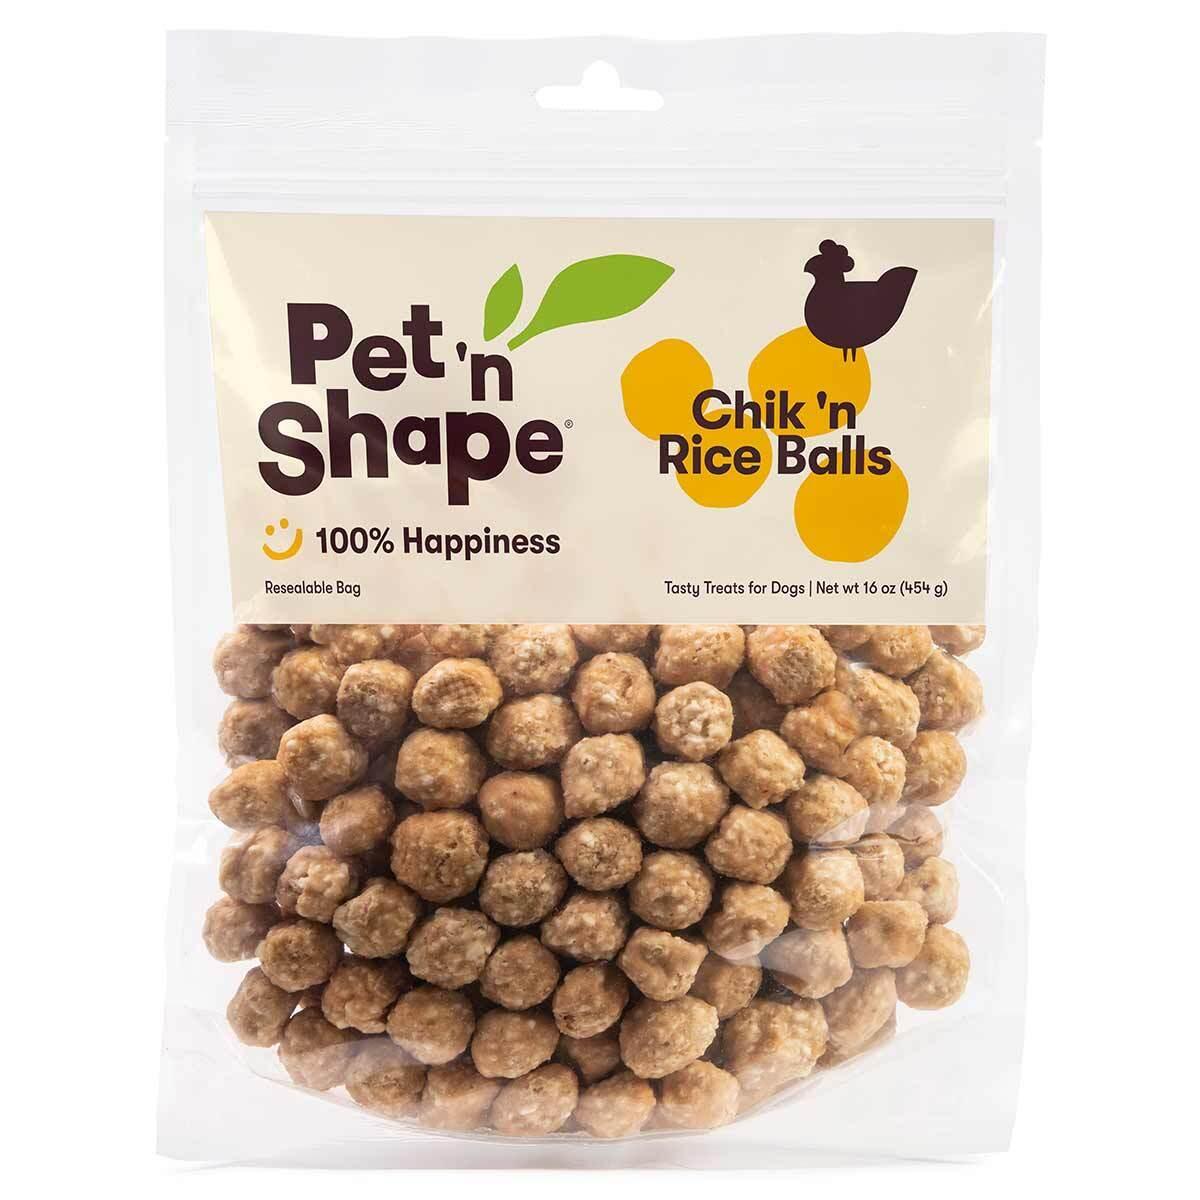 16 oz Pet 'n Shape Chik 'n Rice Balls Dog Treats